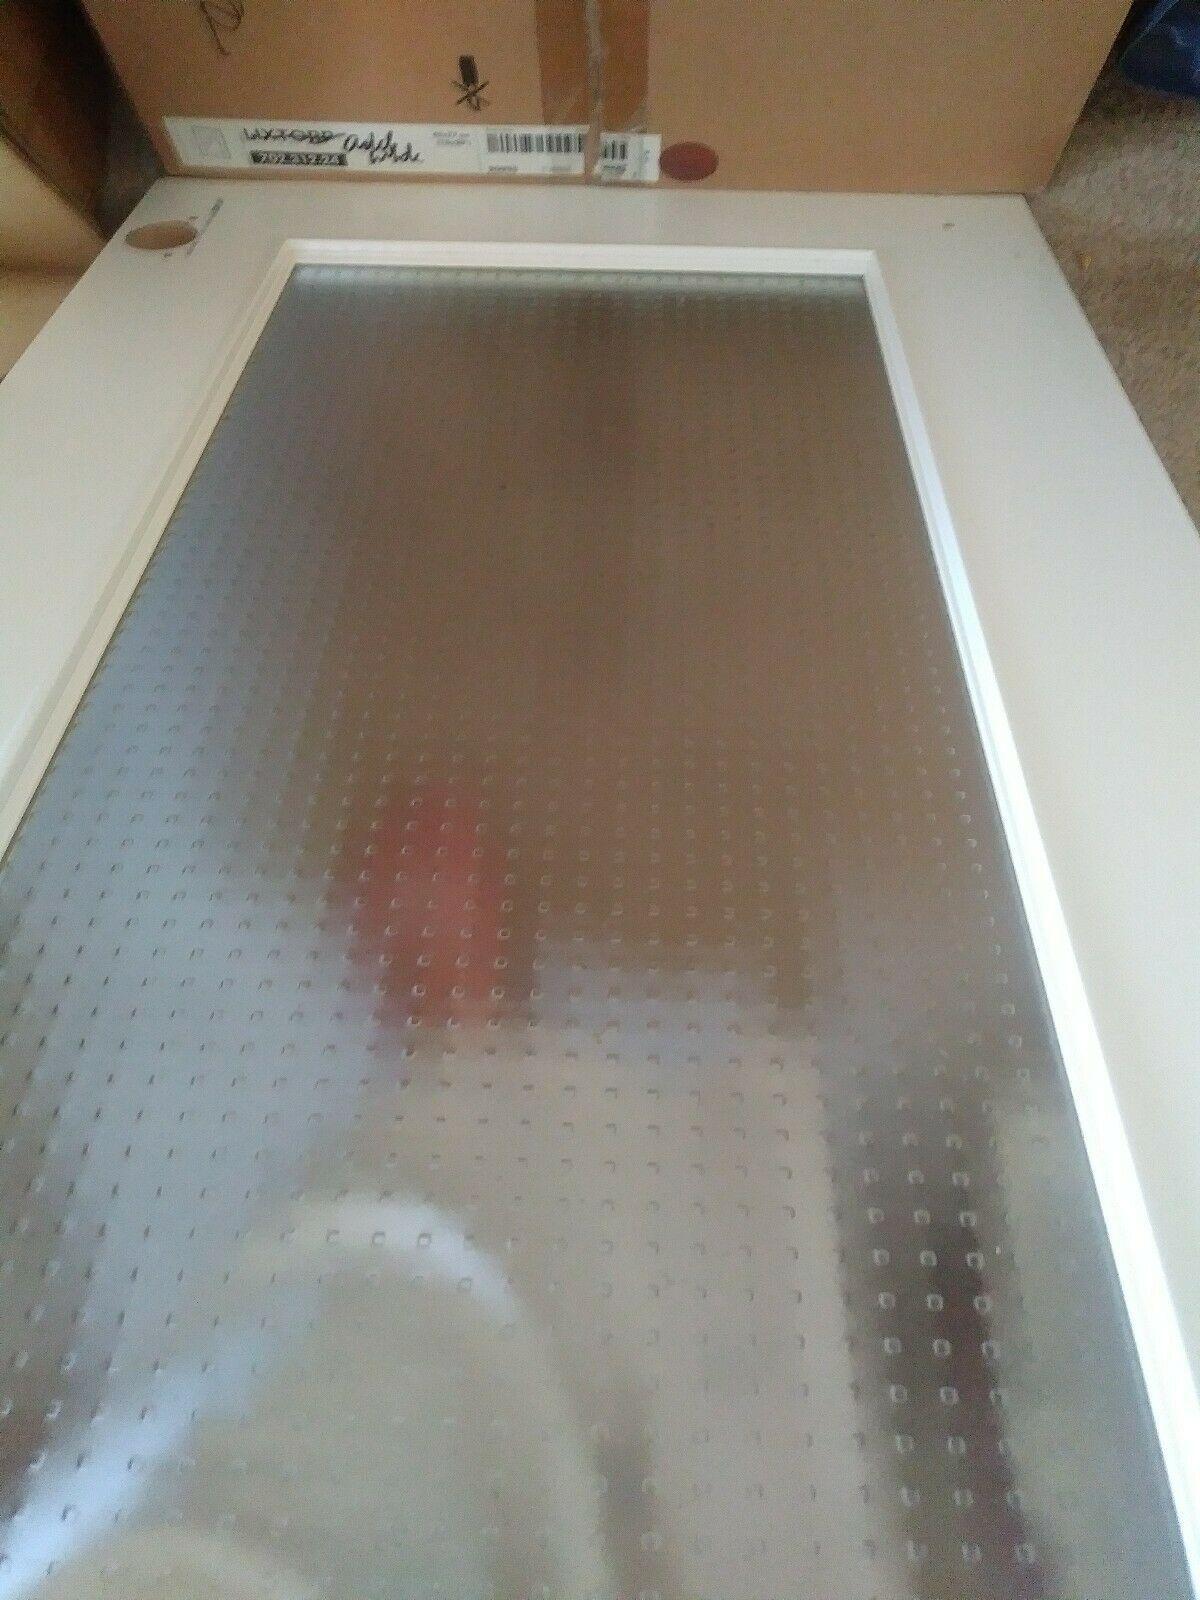 Ikea Cabinet Doors | Ikea cabinets, Cabinet doors, Cabinet ...